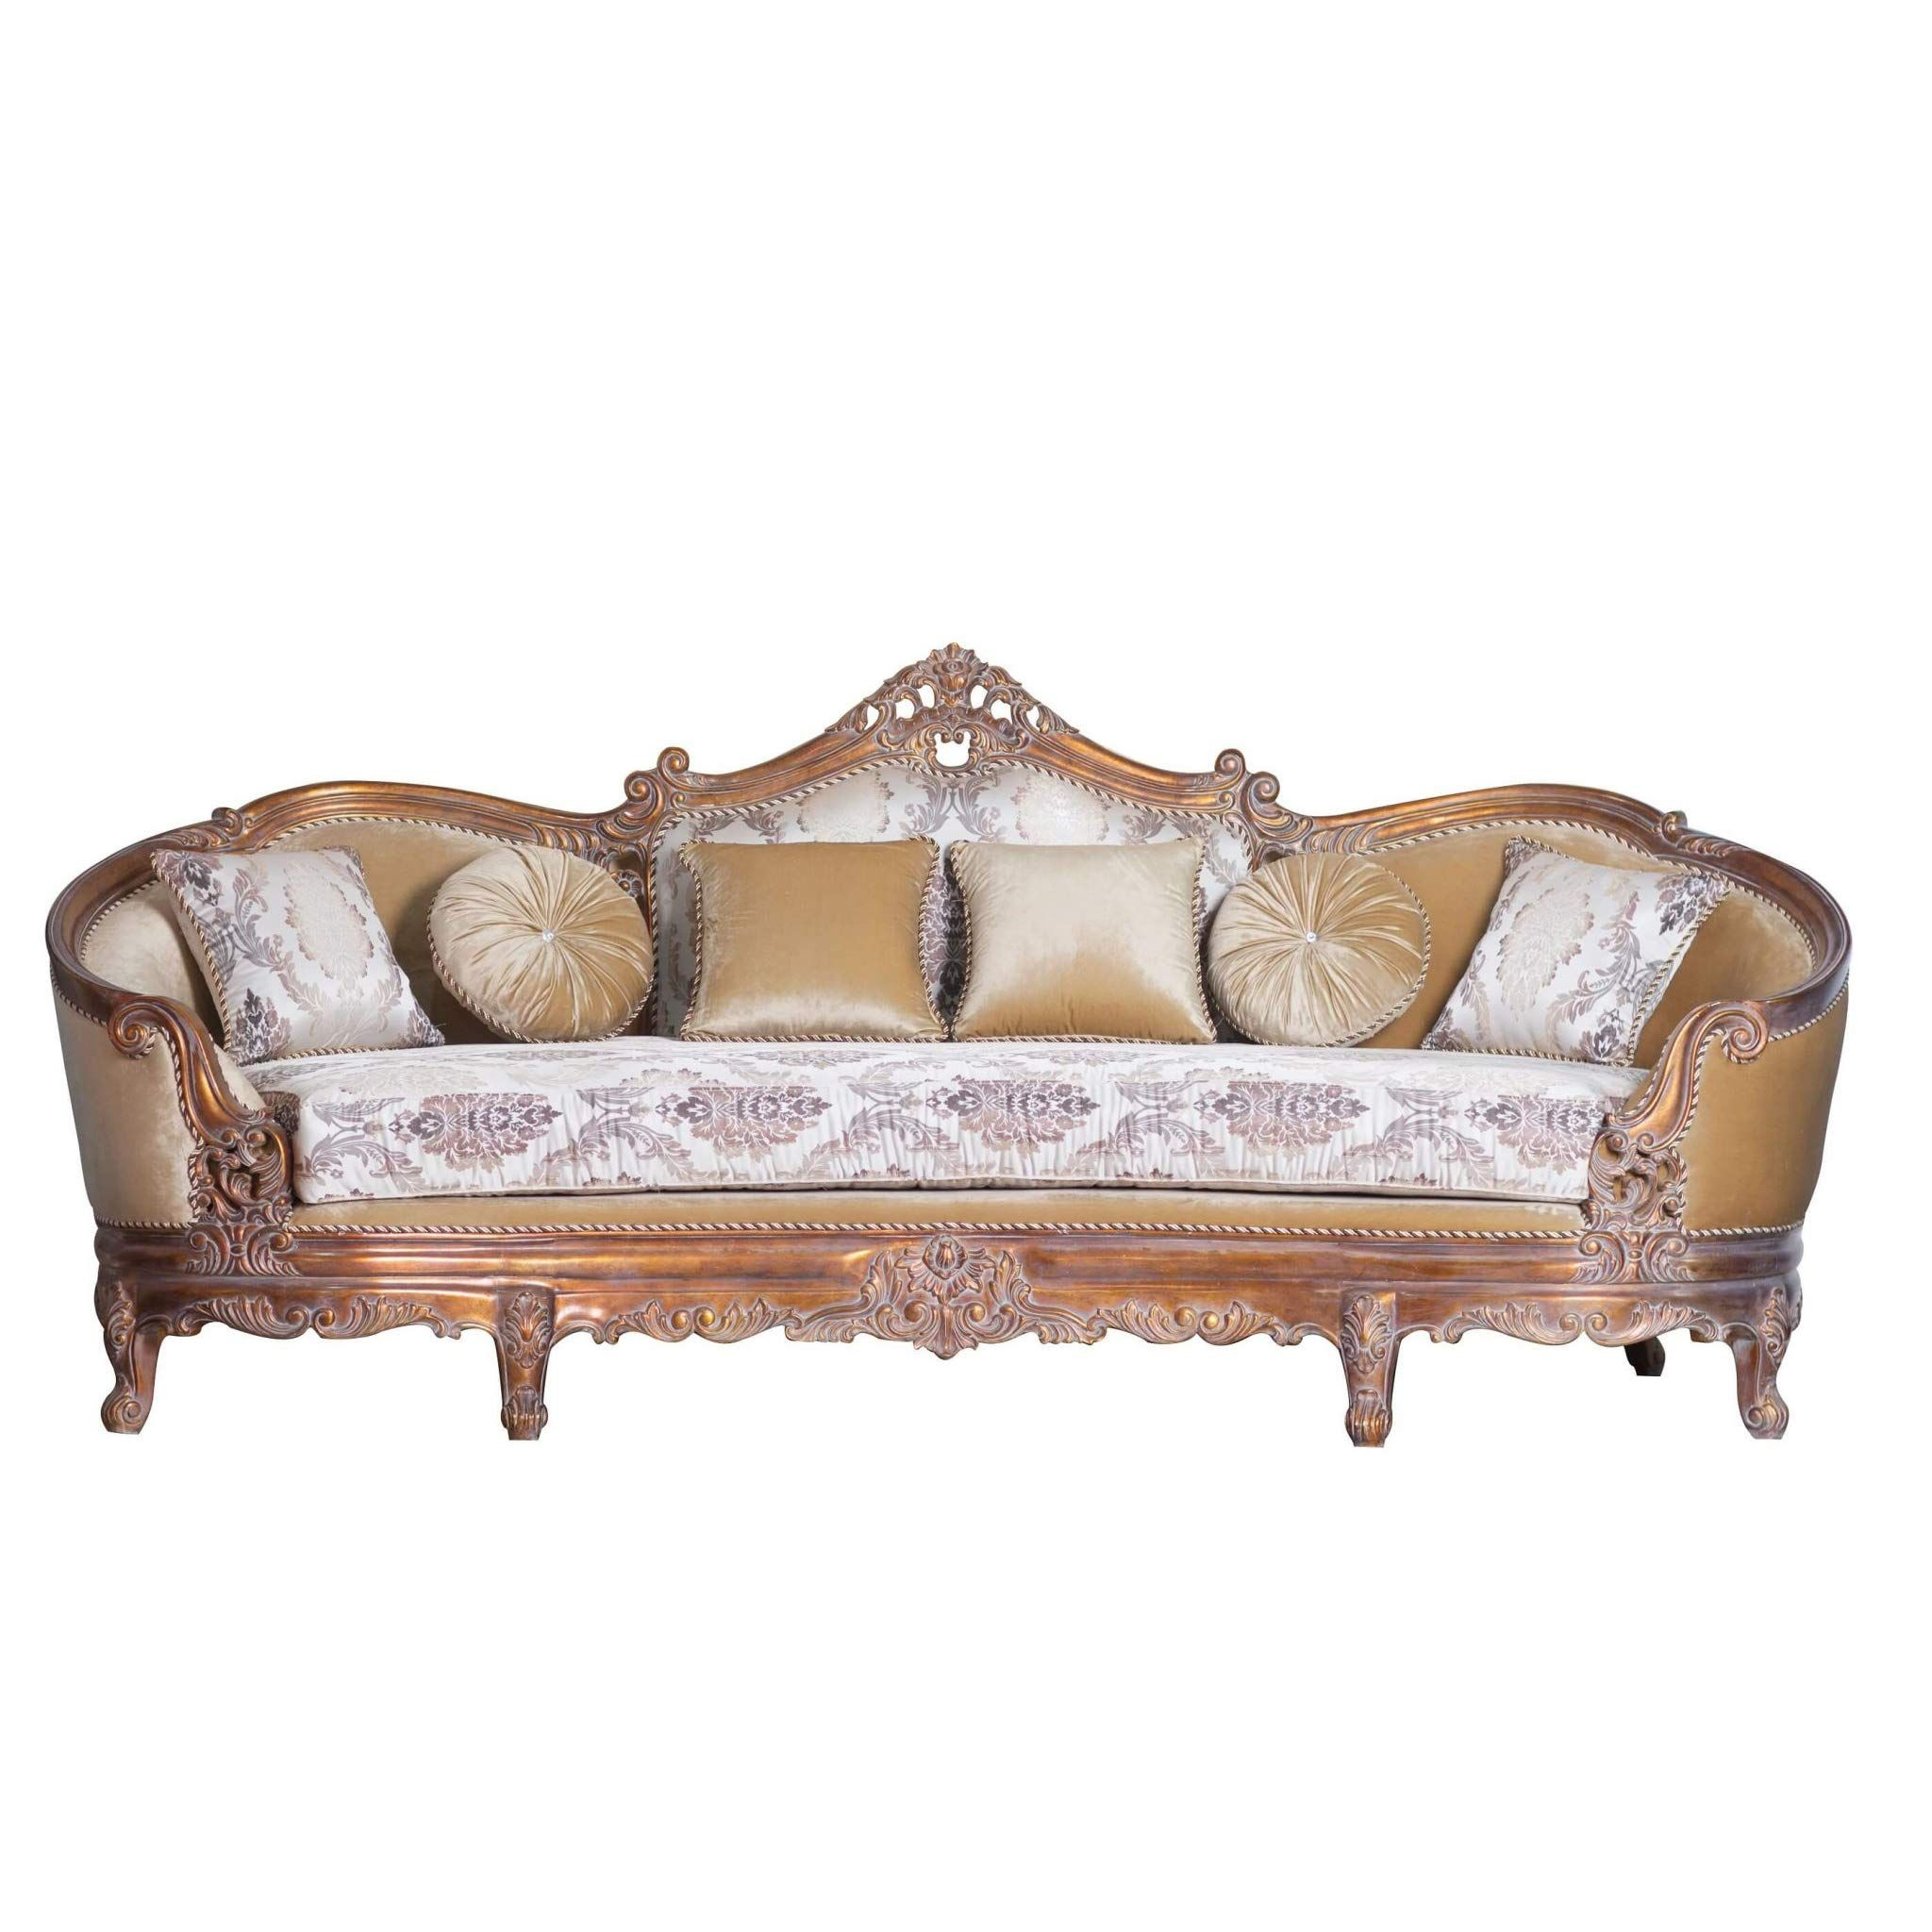 Benjara Wooden Aesthetic Carving Details Curved Sofa Furniture Victorian Sofa